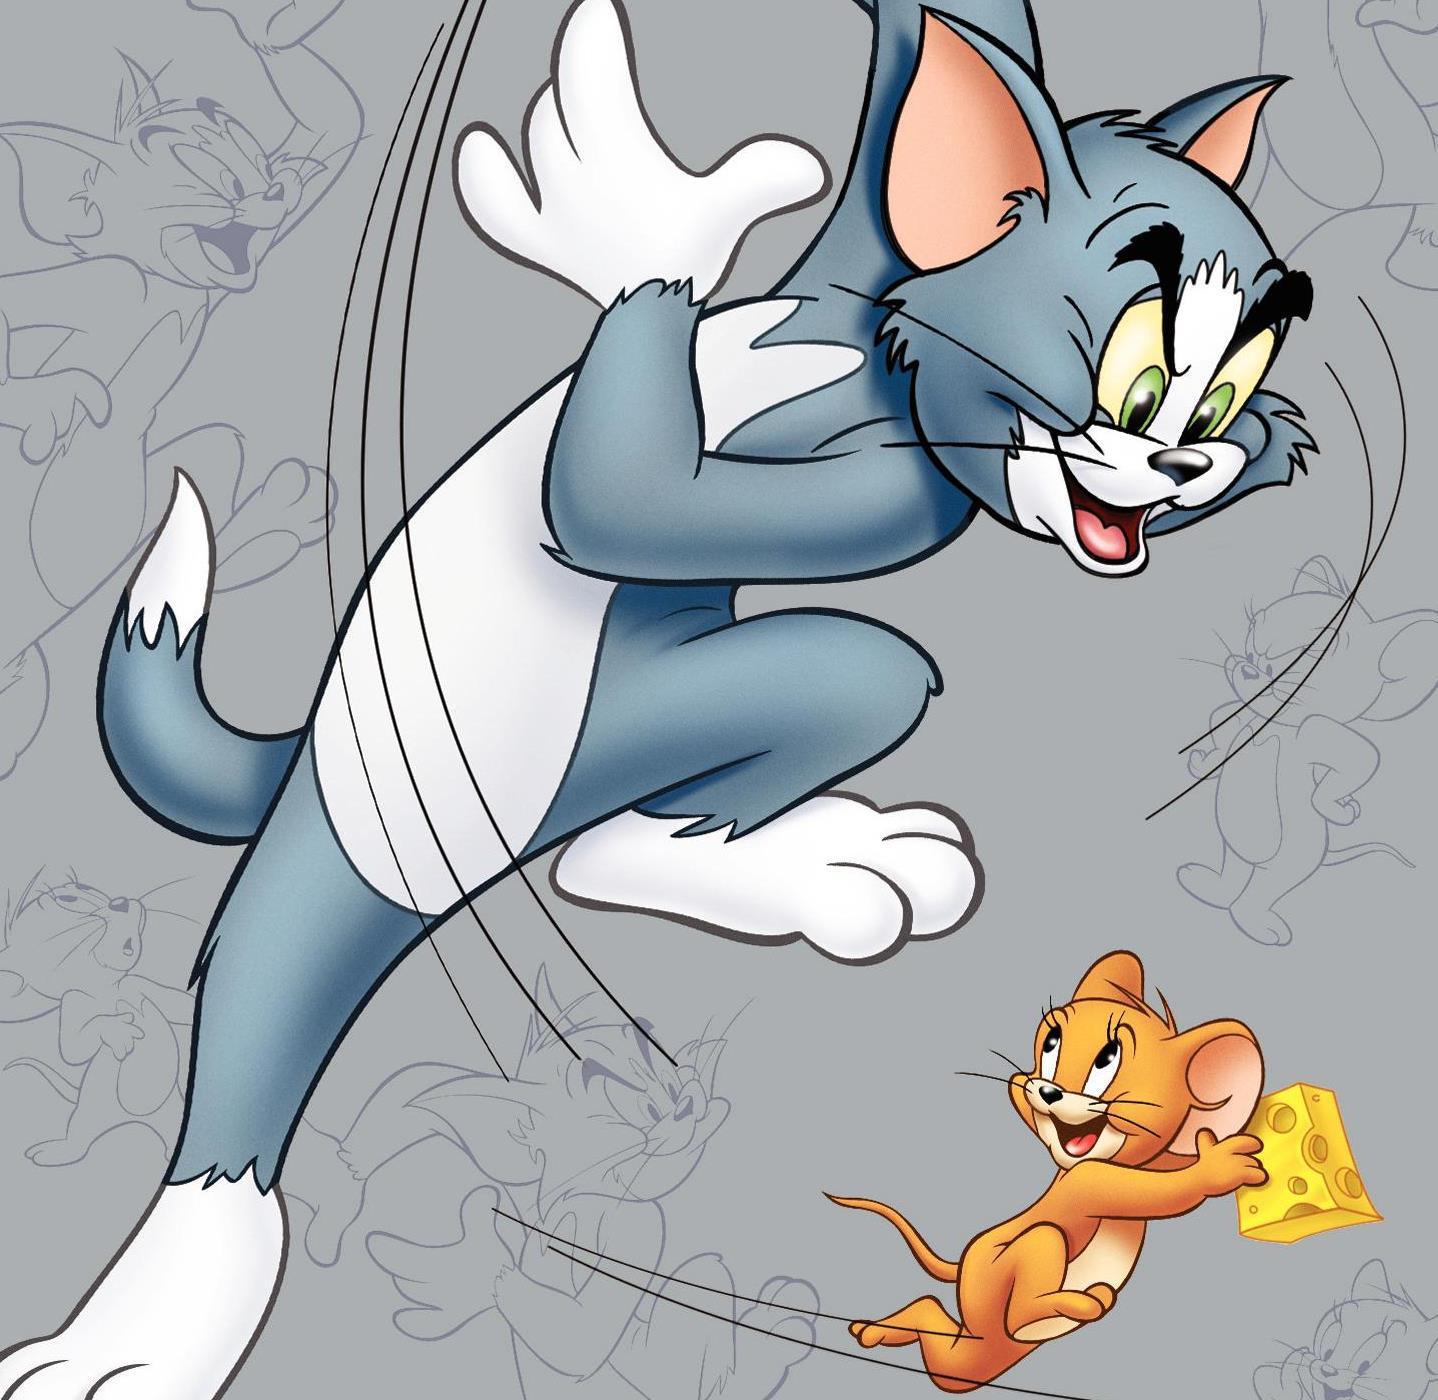 tom and jerry cartoon - HD1438×1400